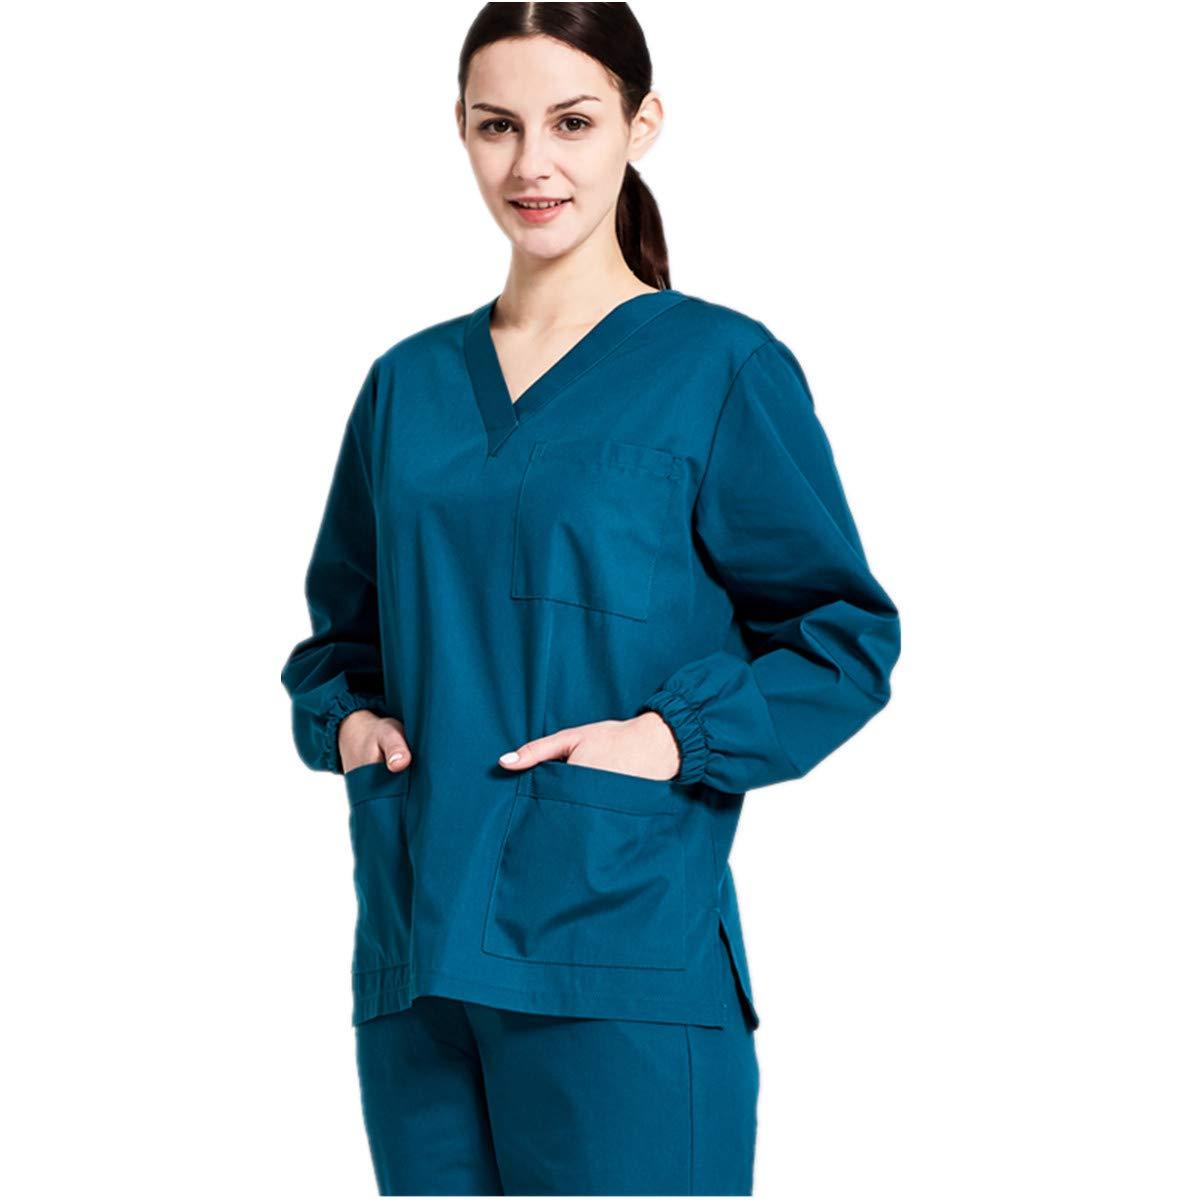 Dark Caribbean XINFU Medical Scurb Sets VNeck Long Sleeve Men and Women Comfortable Work Uniform